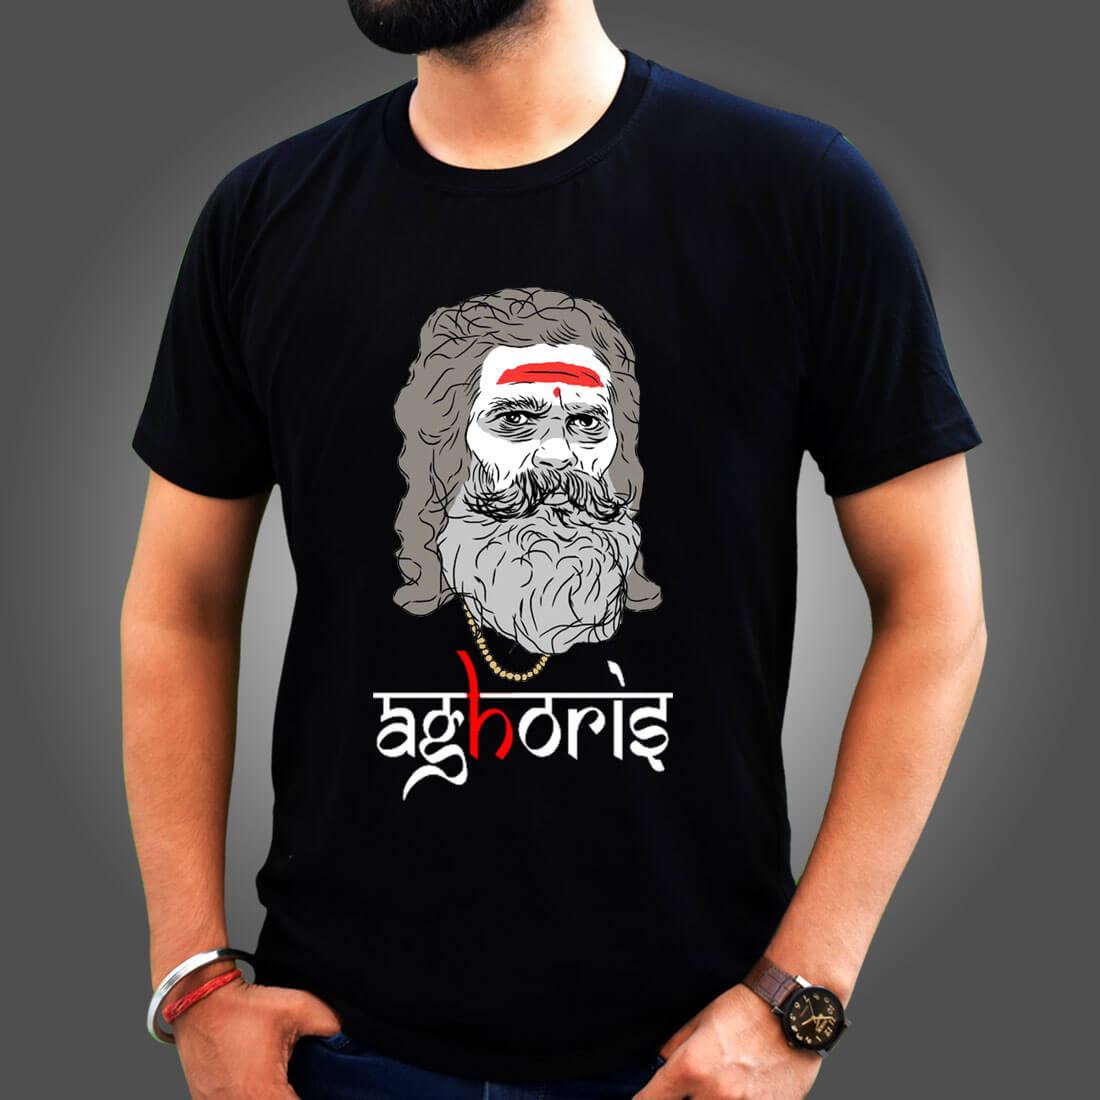 Aghoris Lifestyle Printed Black T-Shirt for Men